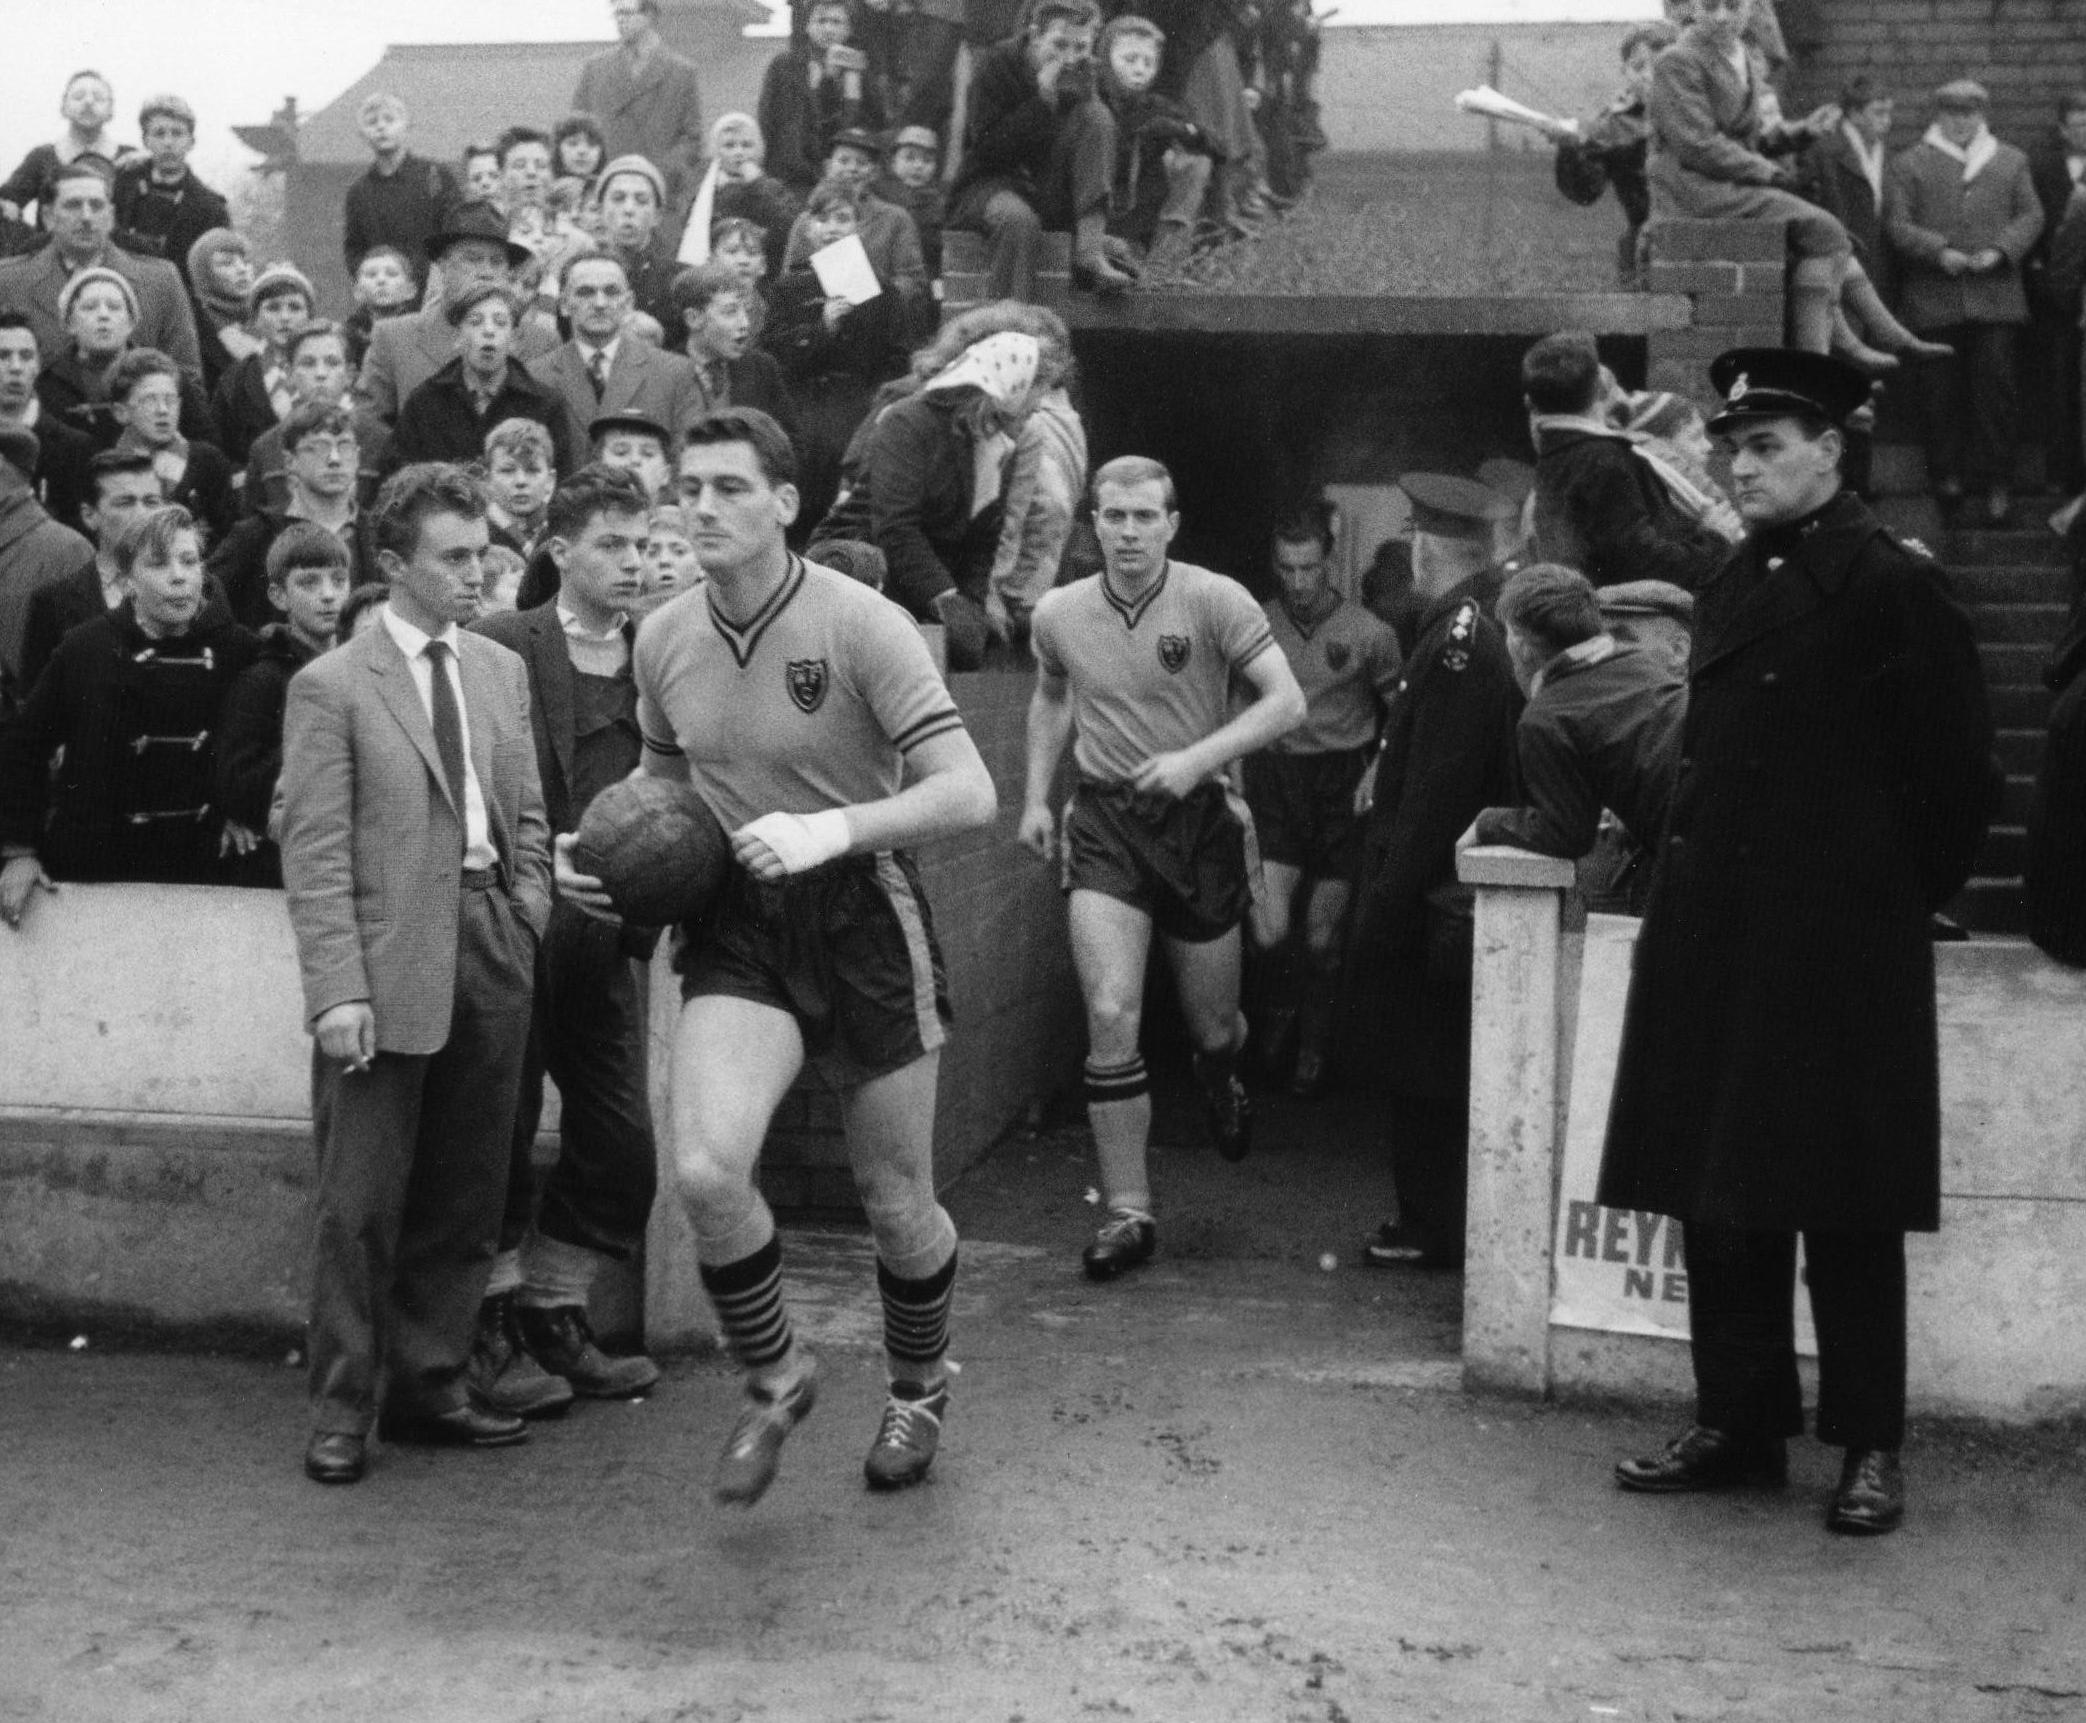 Memories of legendary Watford FC striker Cliff Holton